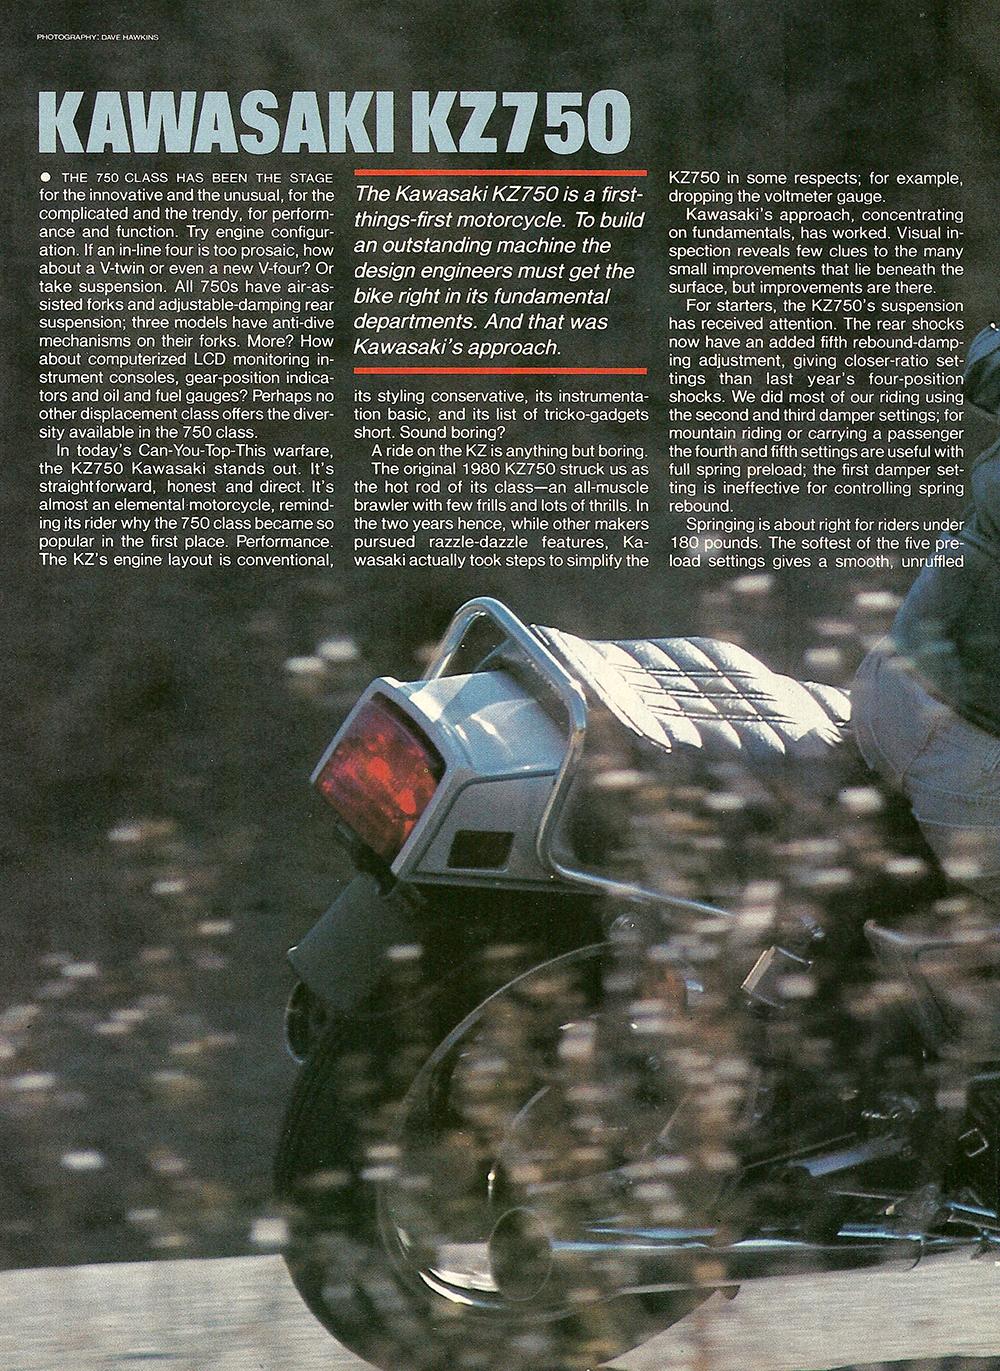 1982 Kawasaki kz750 road test 01.JPG